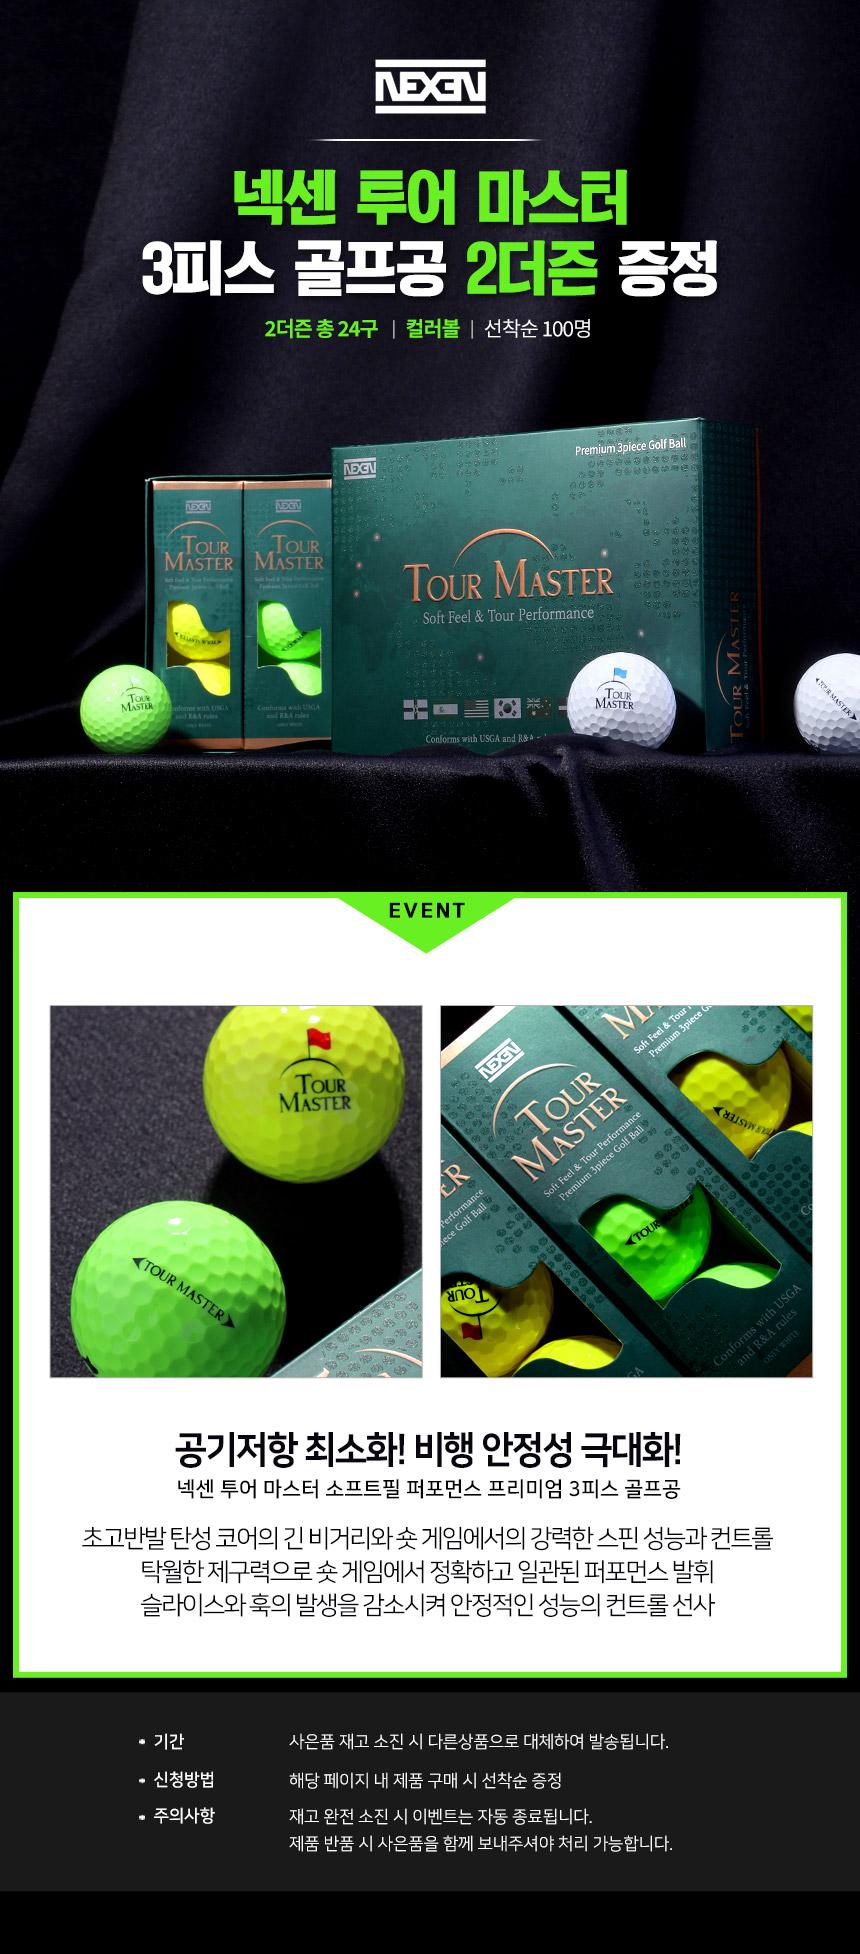 nexen_tour_master_ball_gift_2box_21.jpg